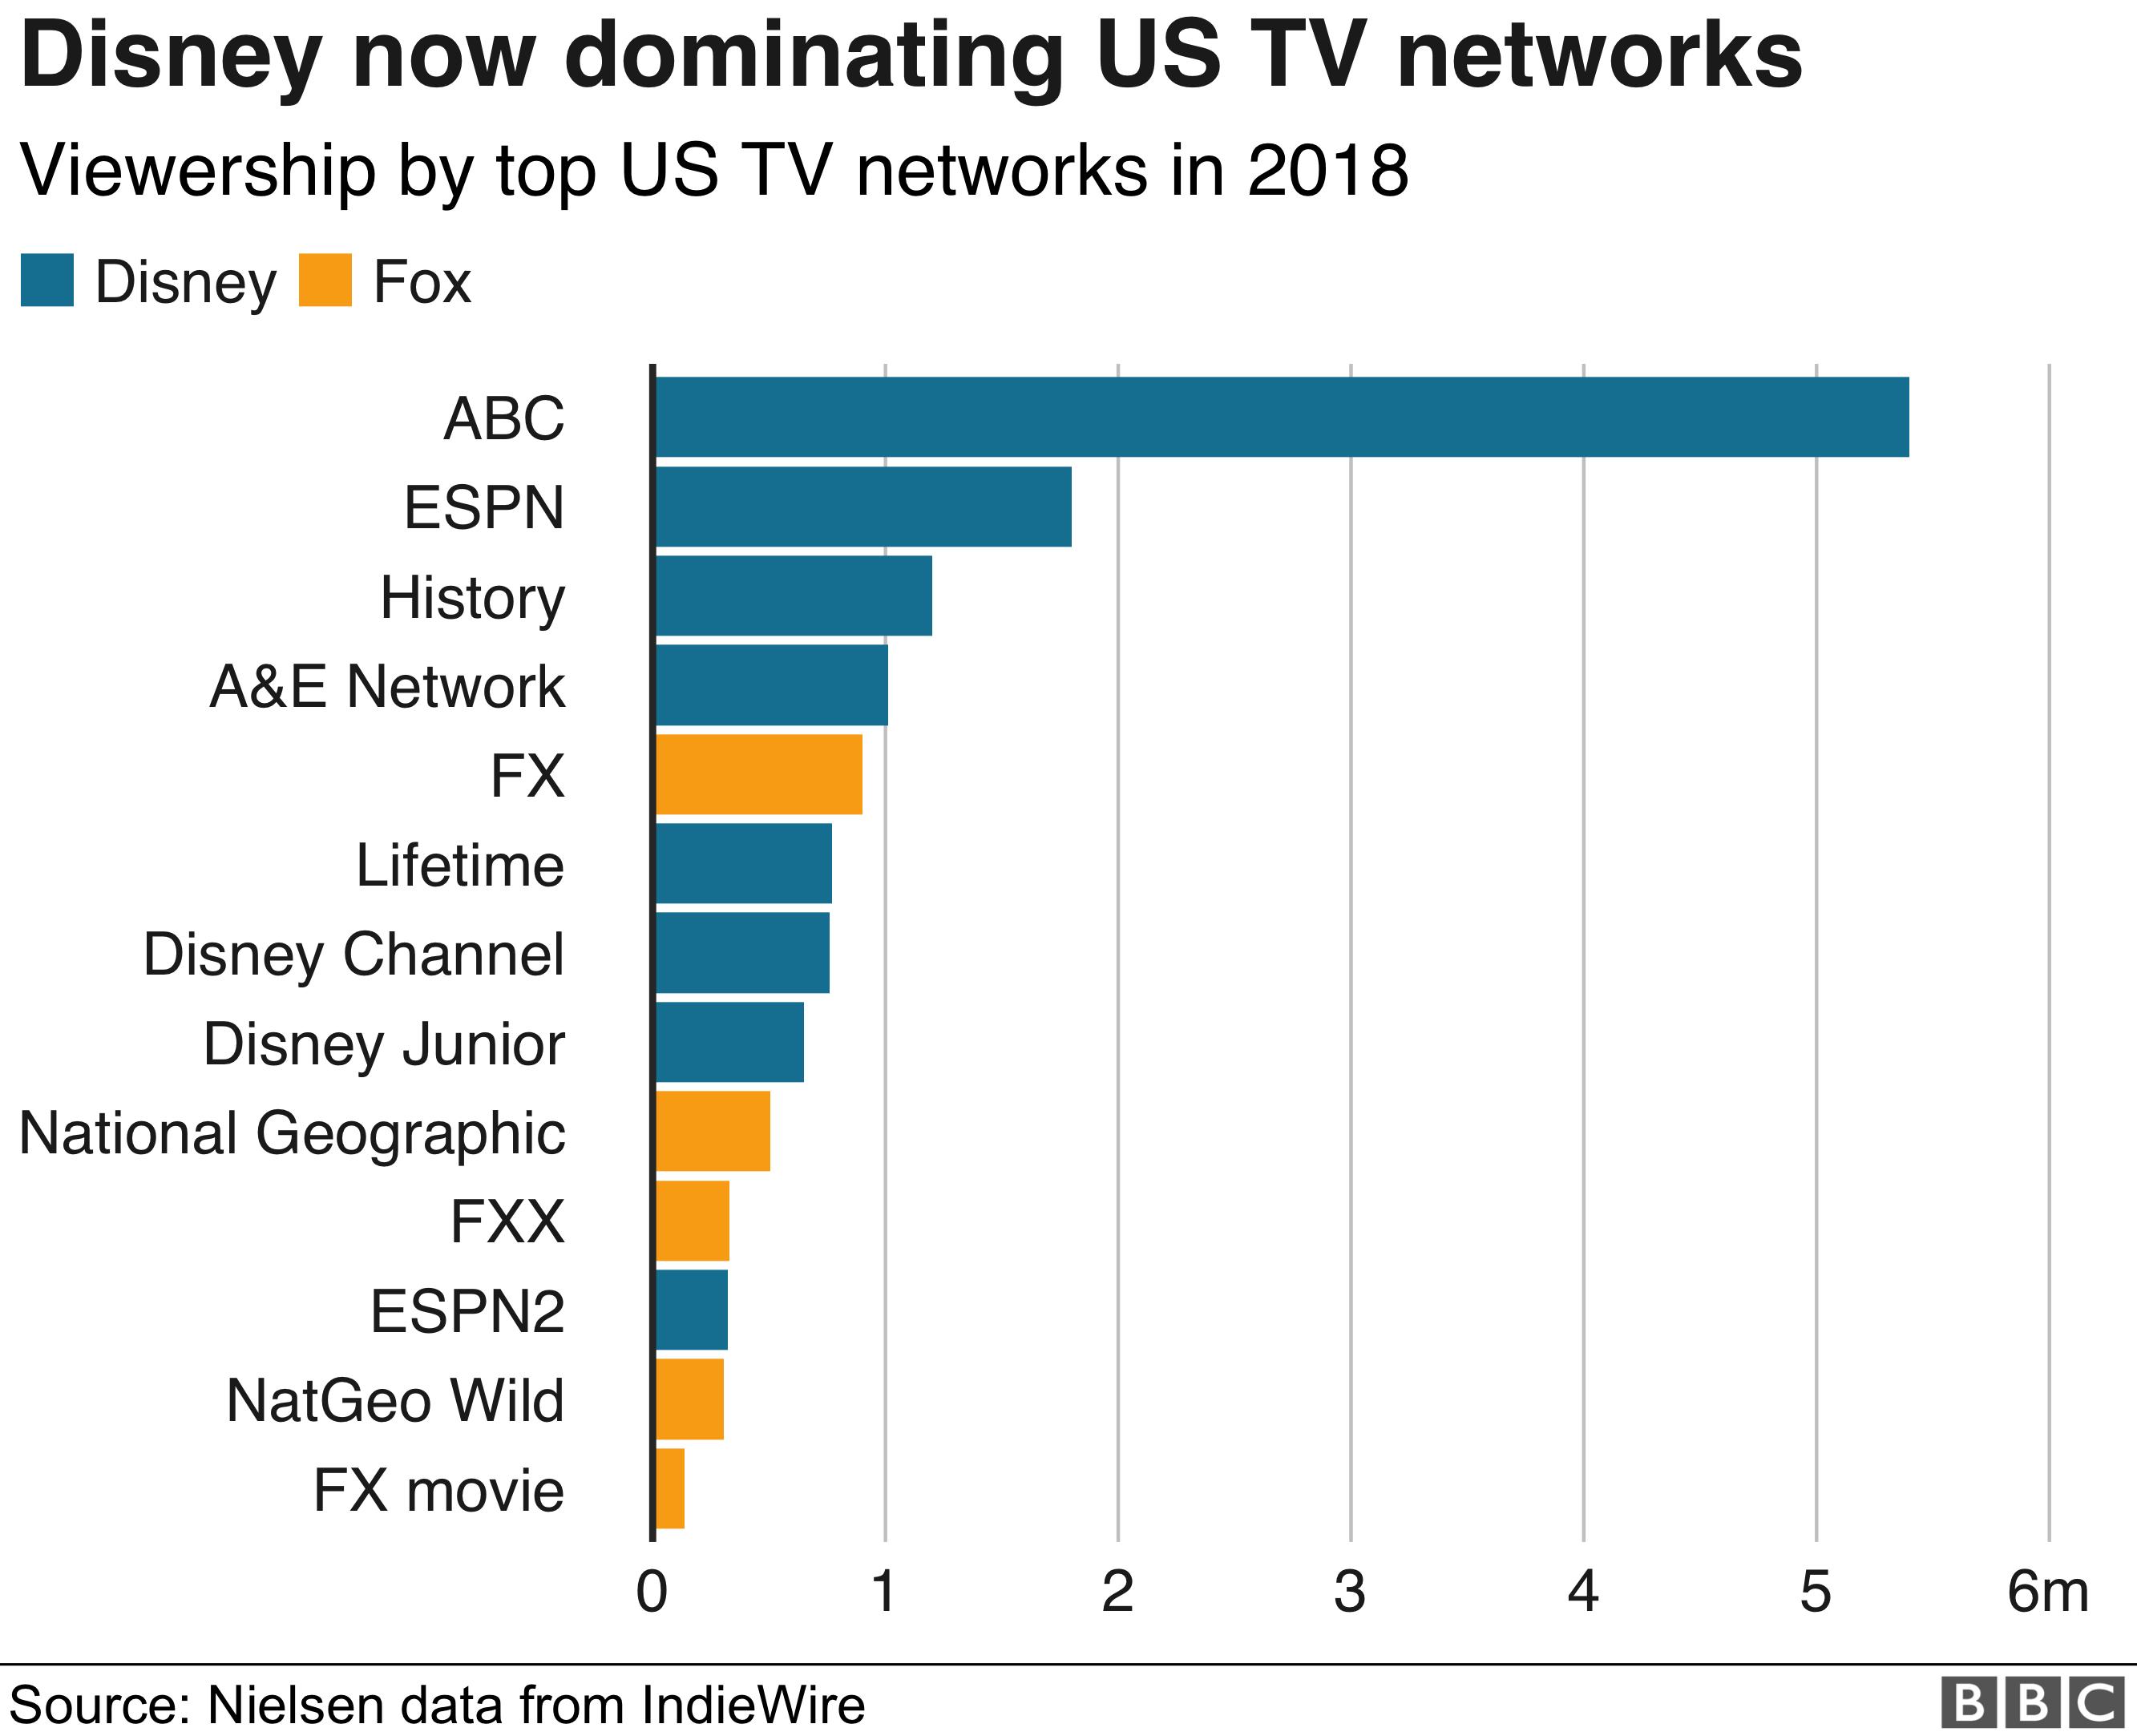 Disney viewing figures in US